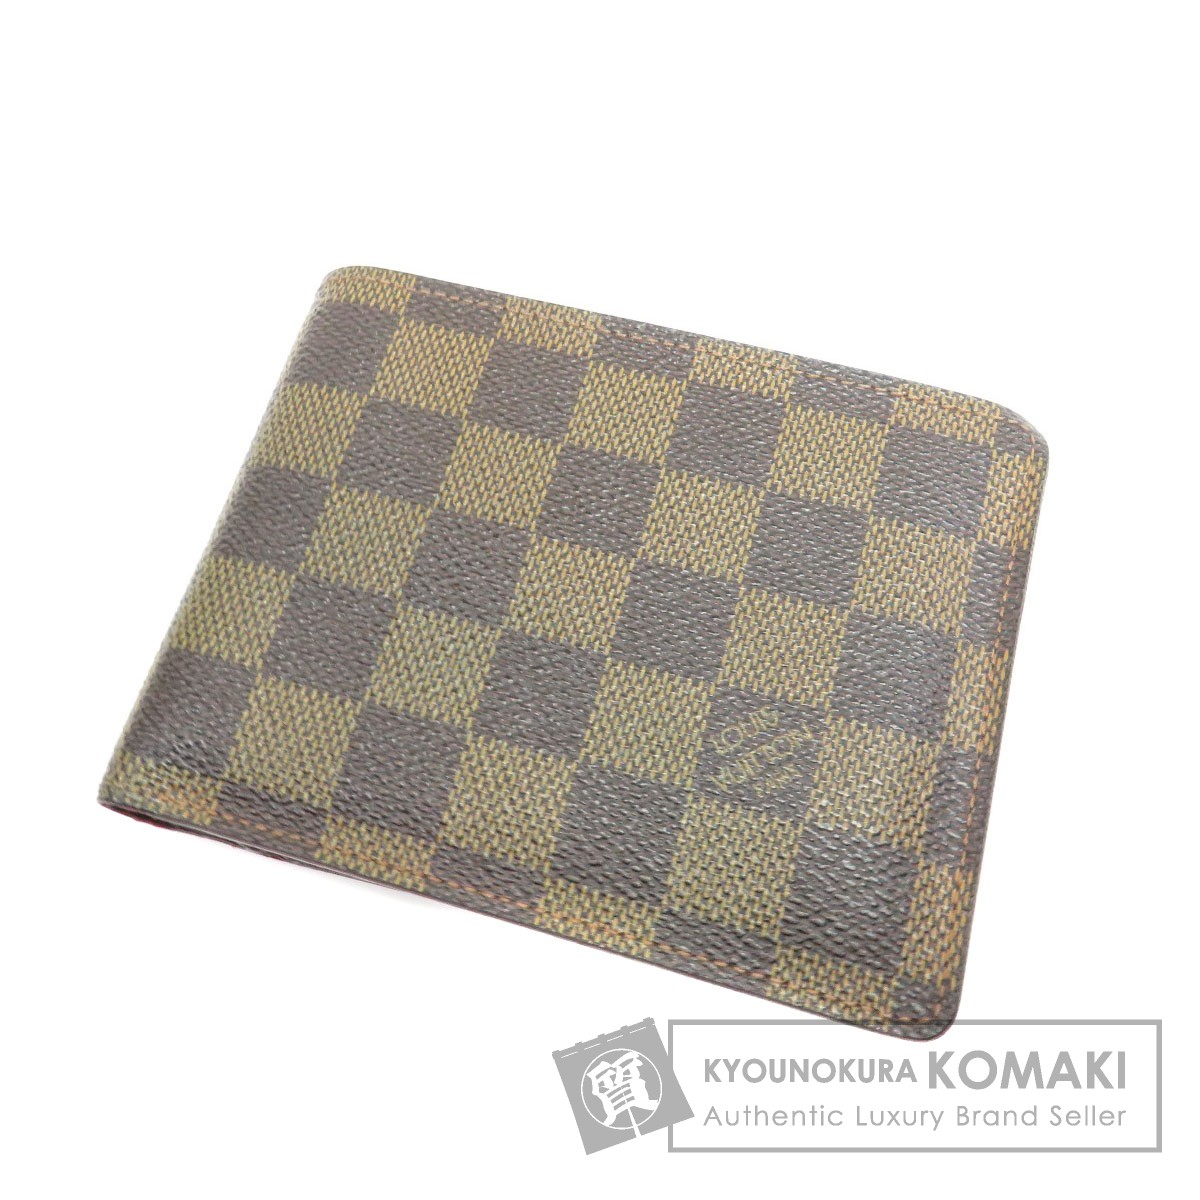 LOUIS VUITTON N60011 ポルトフォイユ・フロリン 二つ折り財布(小銭入れあり) ダミエキャンバス ユニセックス 【中古】【ルイ・ヴィトン】